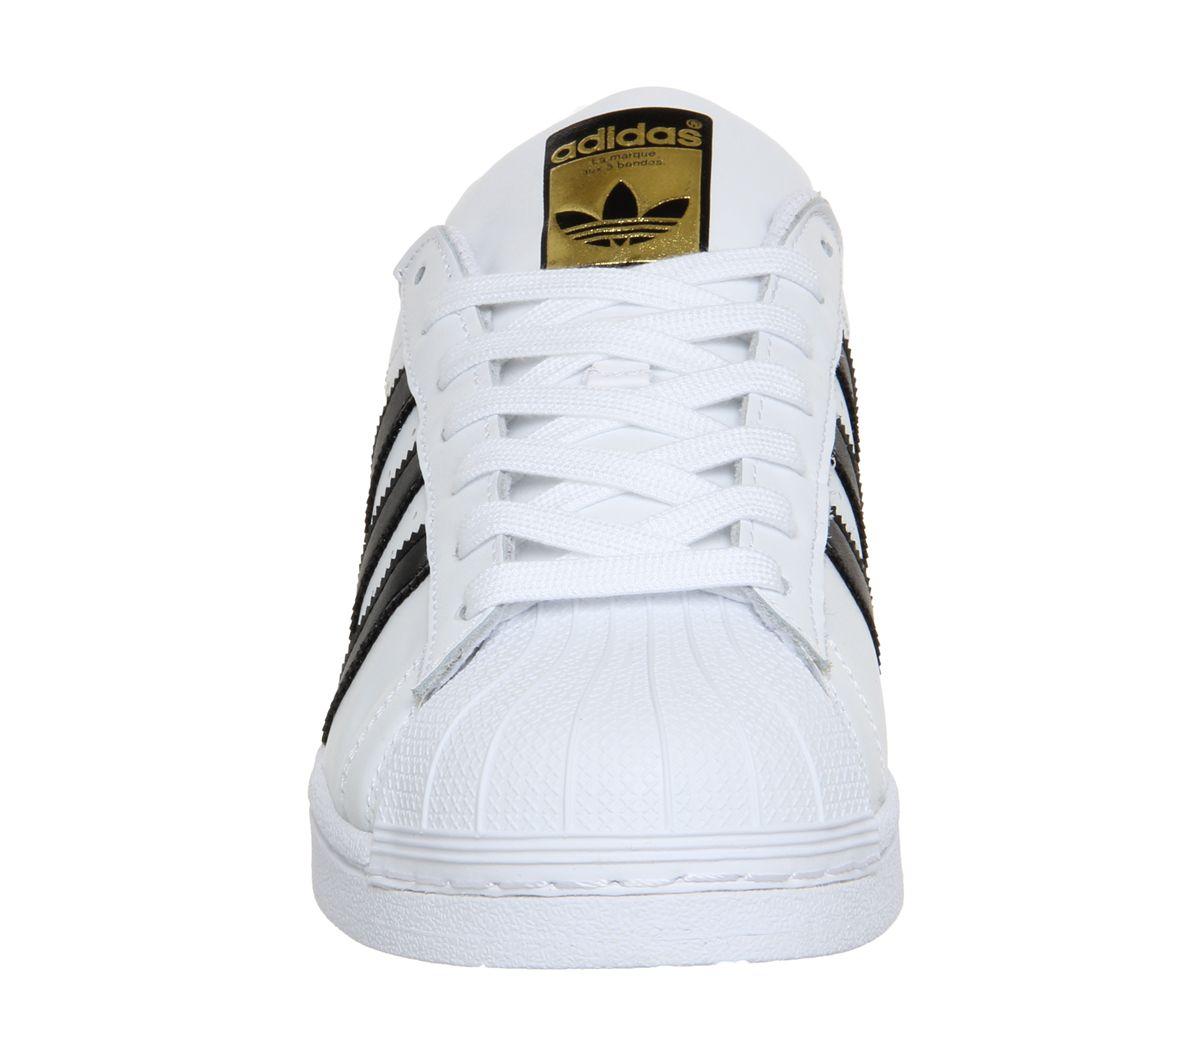 Uomo Adidas Superstar 1 Bianco Nero Foundation Scarpe da